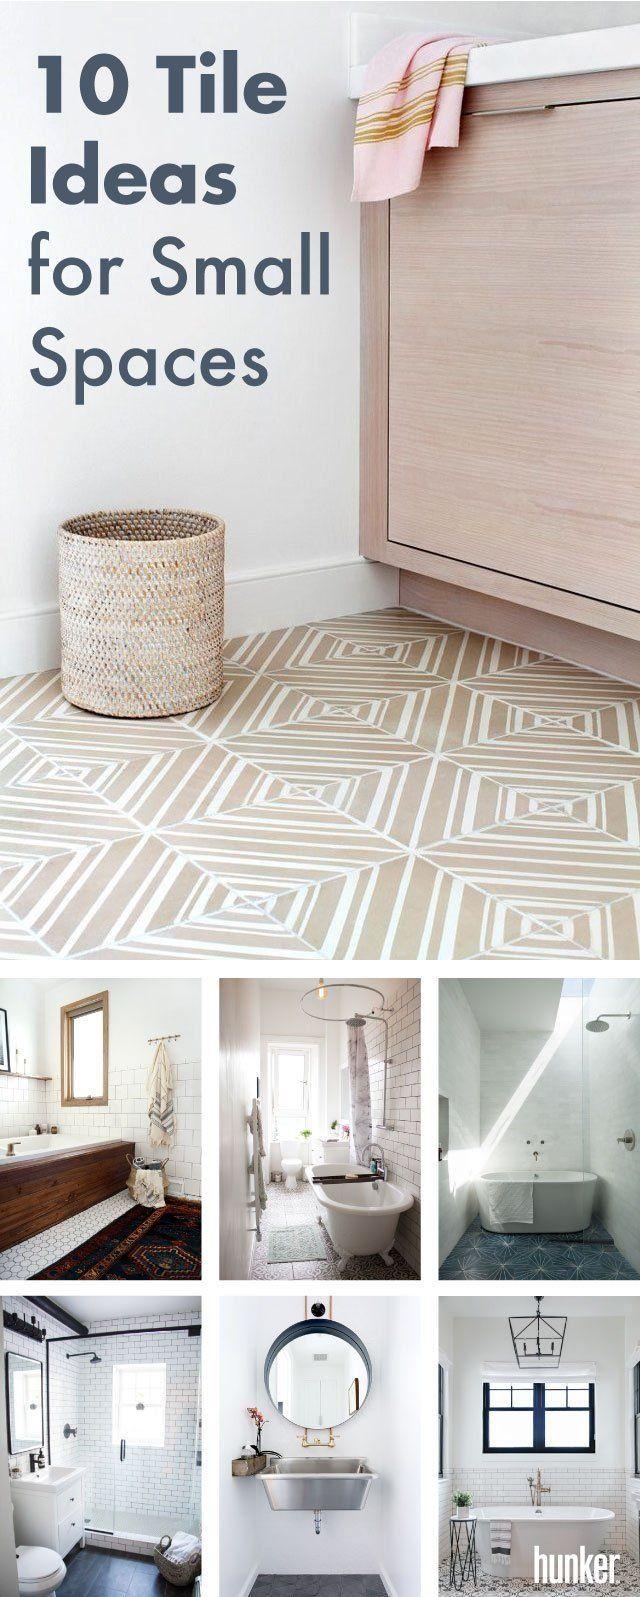 10 ceramic bathroom floor tile ideas for small spaces modern rh pinterest com